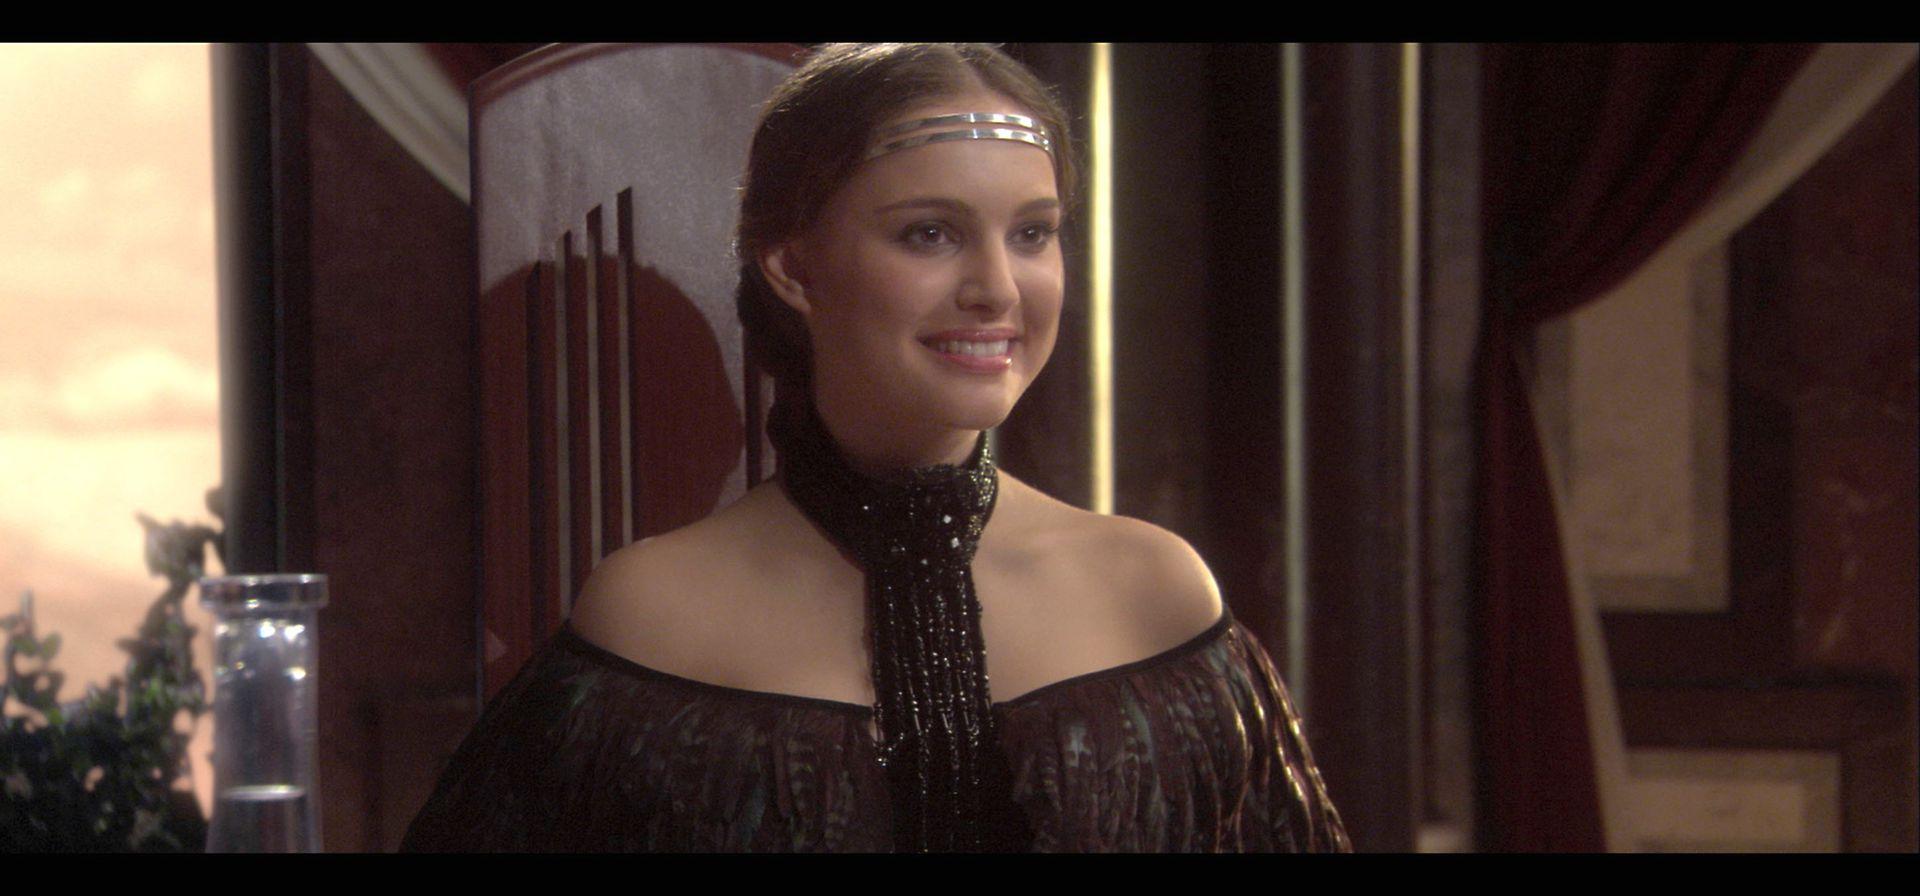 Star wars padme amidala sex consider, that